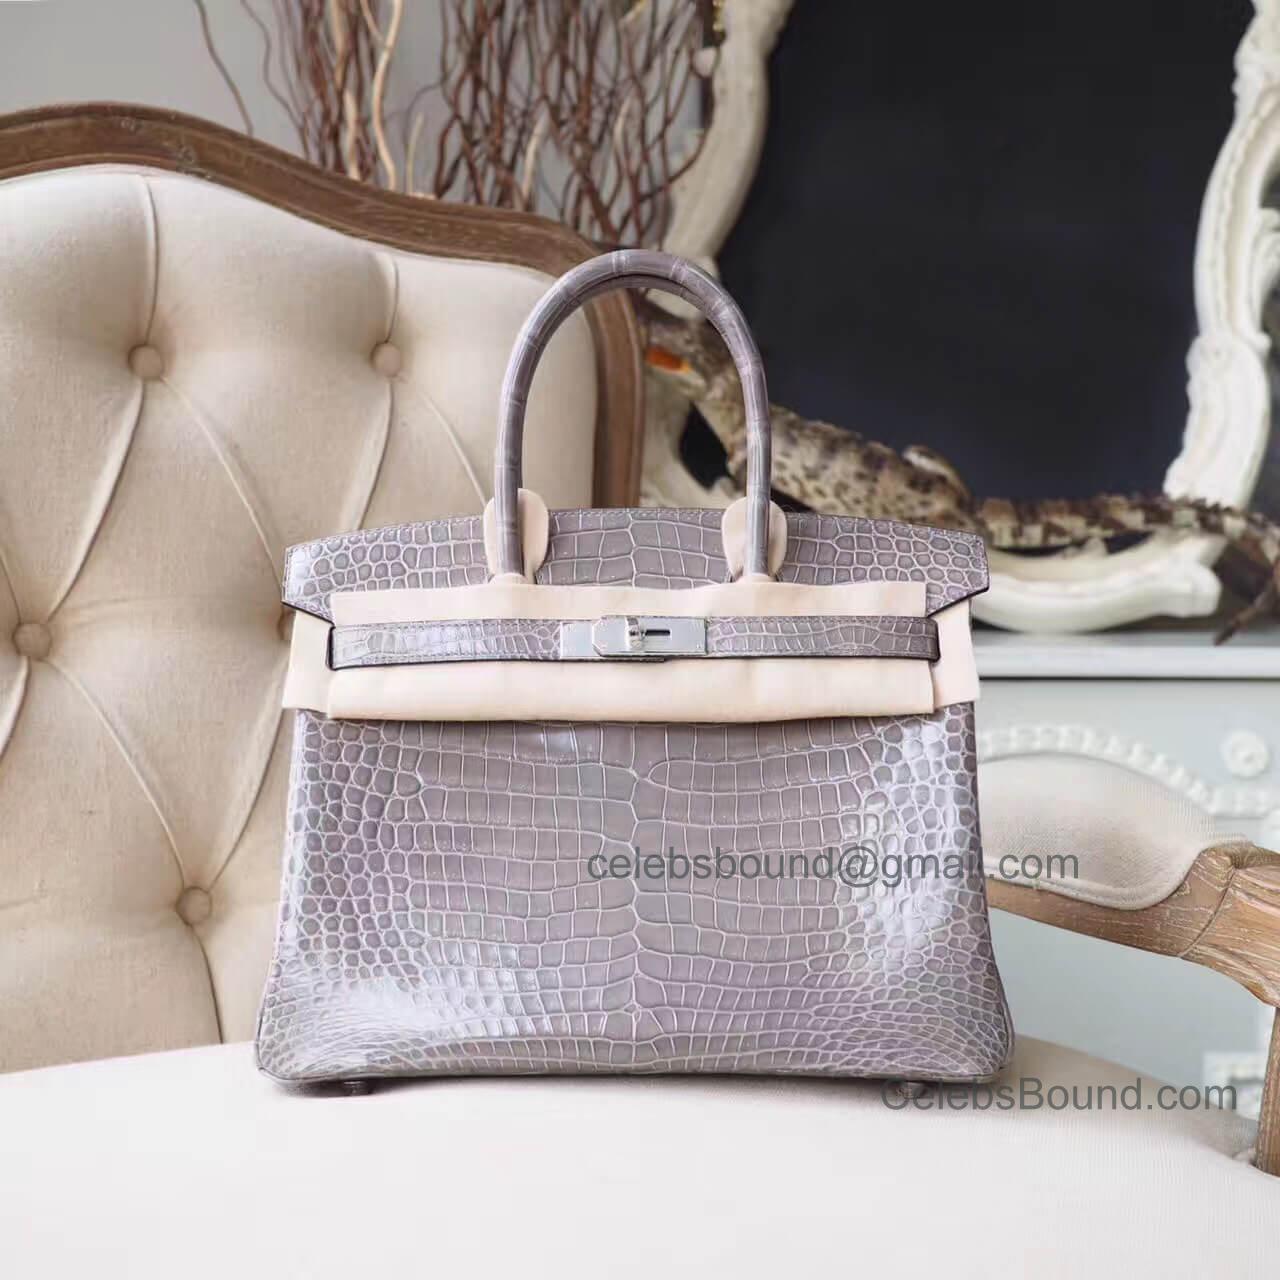 deef11cdbf8 Copy Hermes Birkin 30 Bag in Gris Tourterelle Shiny Porosus Croc PHW -